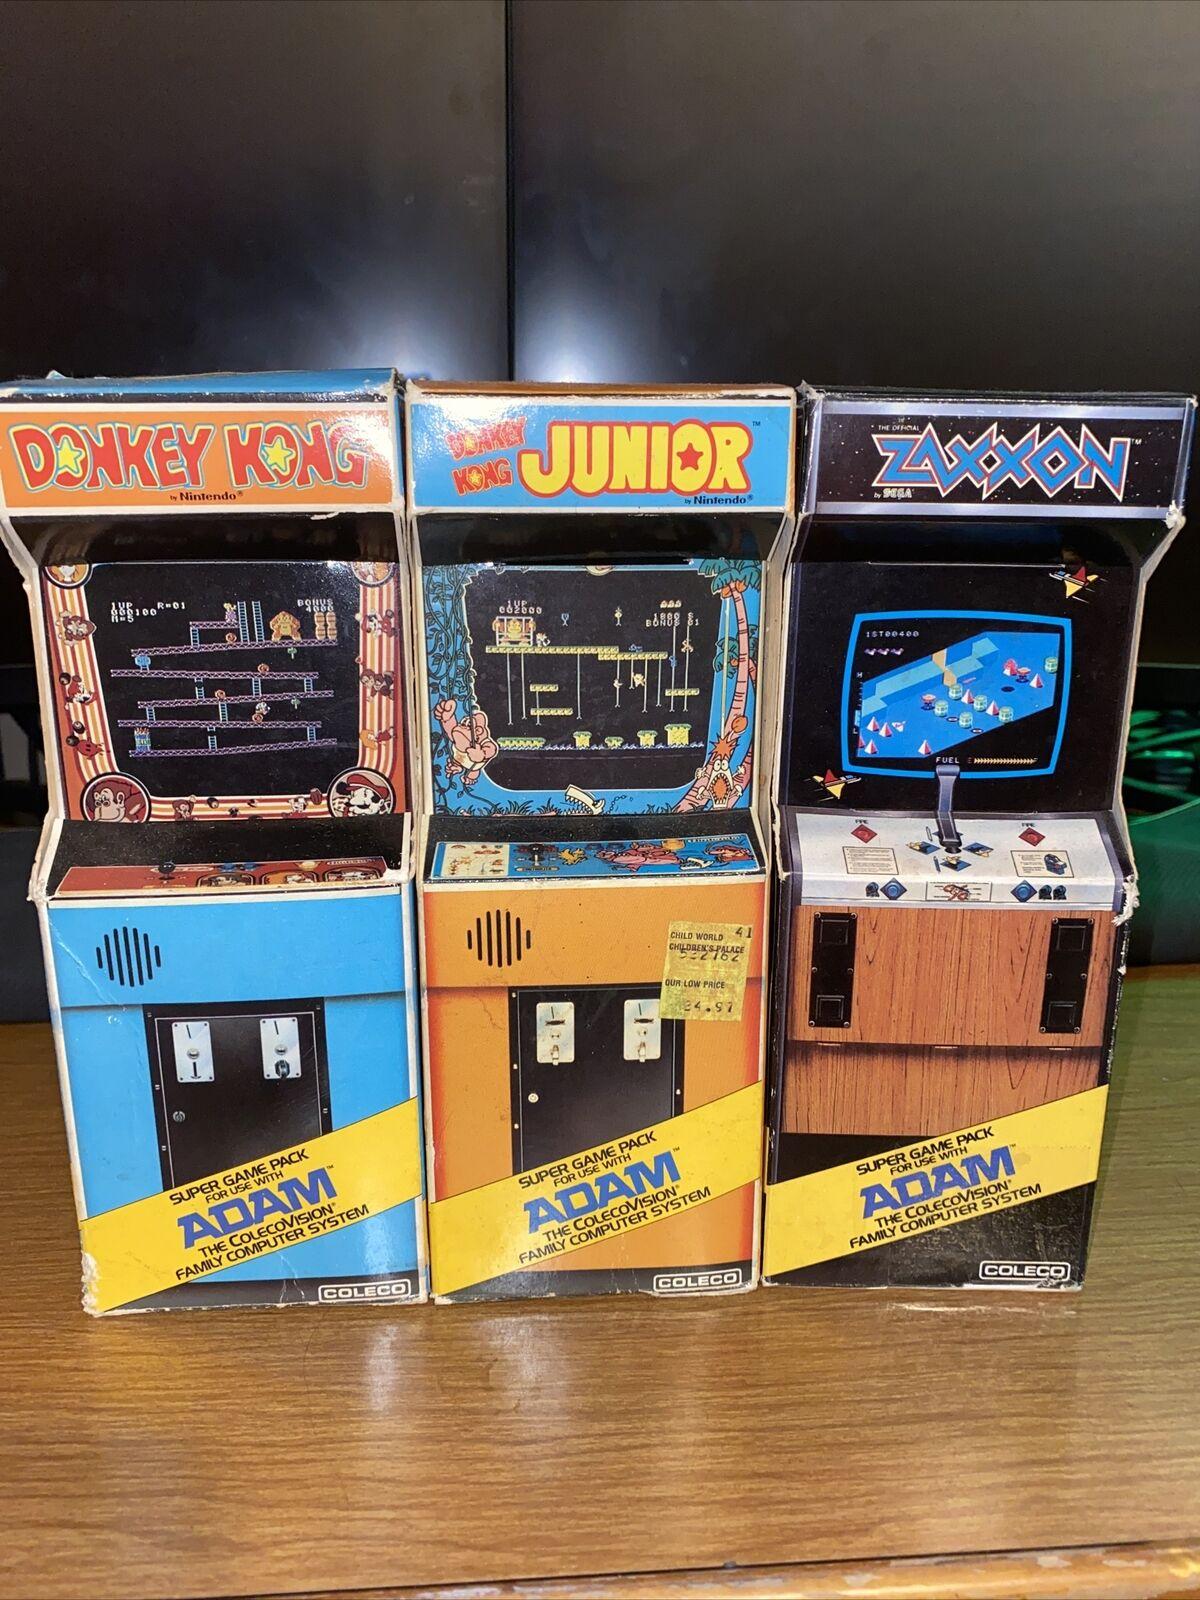 Image 1 - ColecoAdam Arcade Super Game Pack Full Set CIB Donkey Kong Donkey Kong Jr Zaxxon